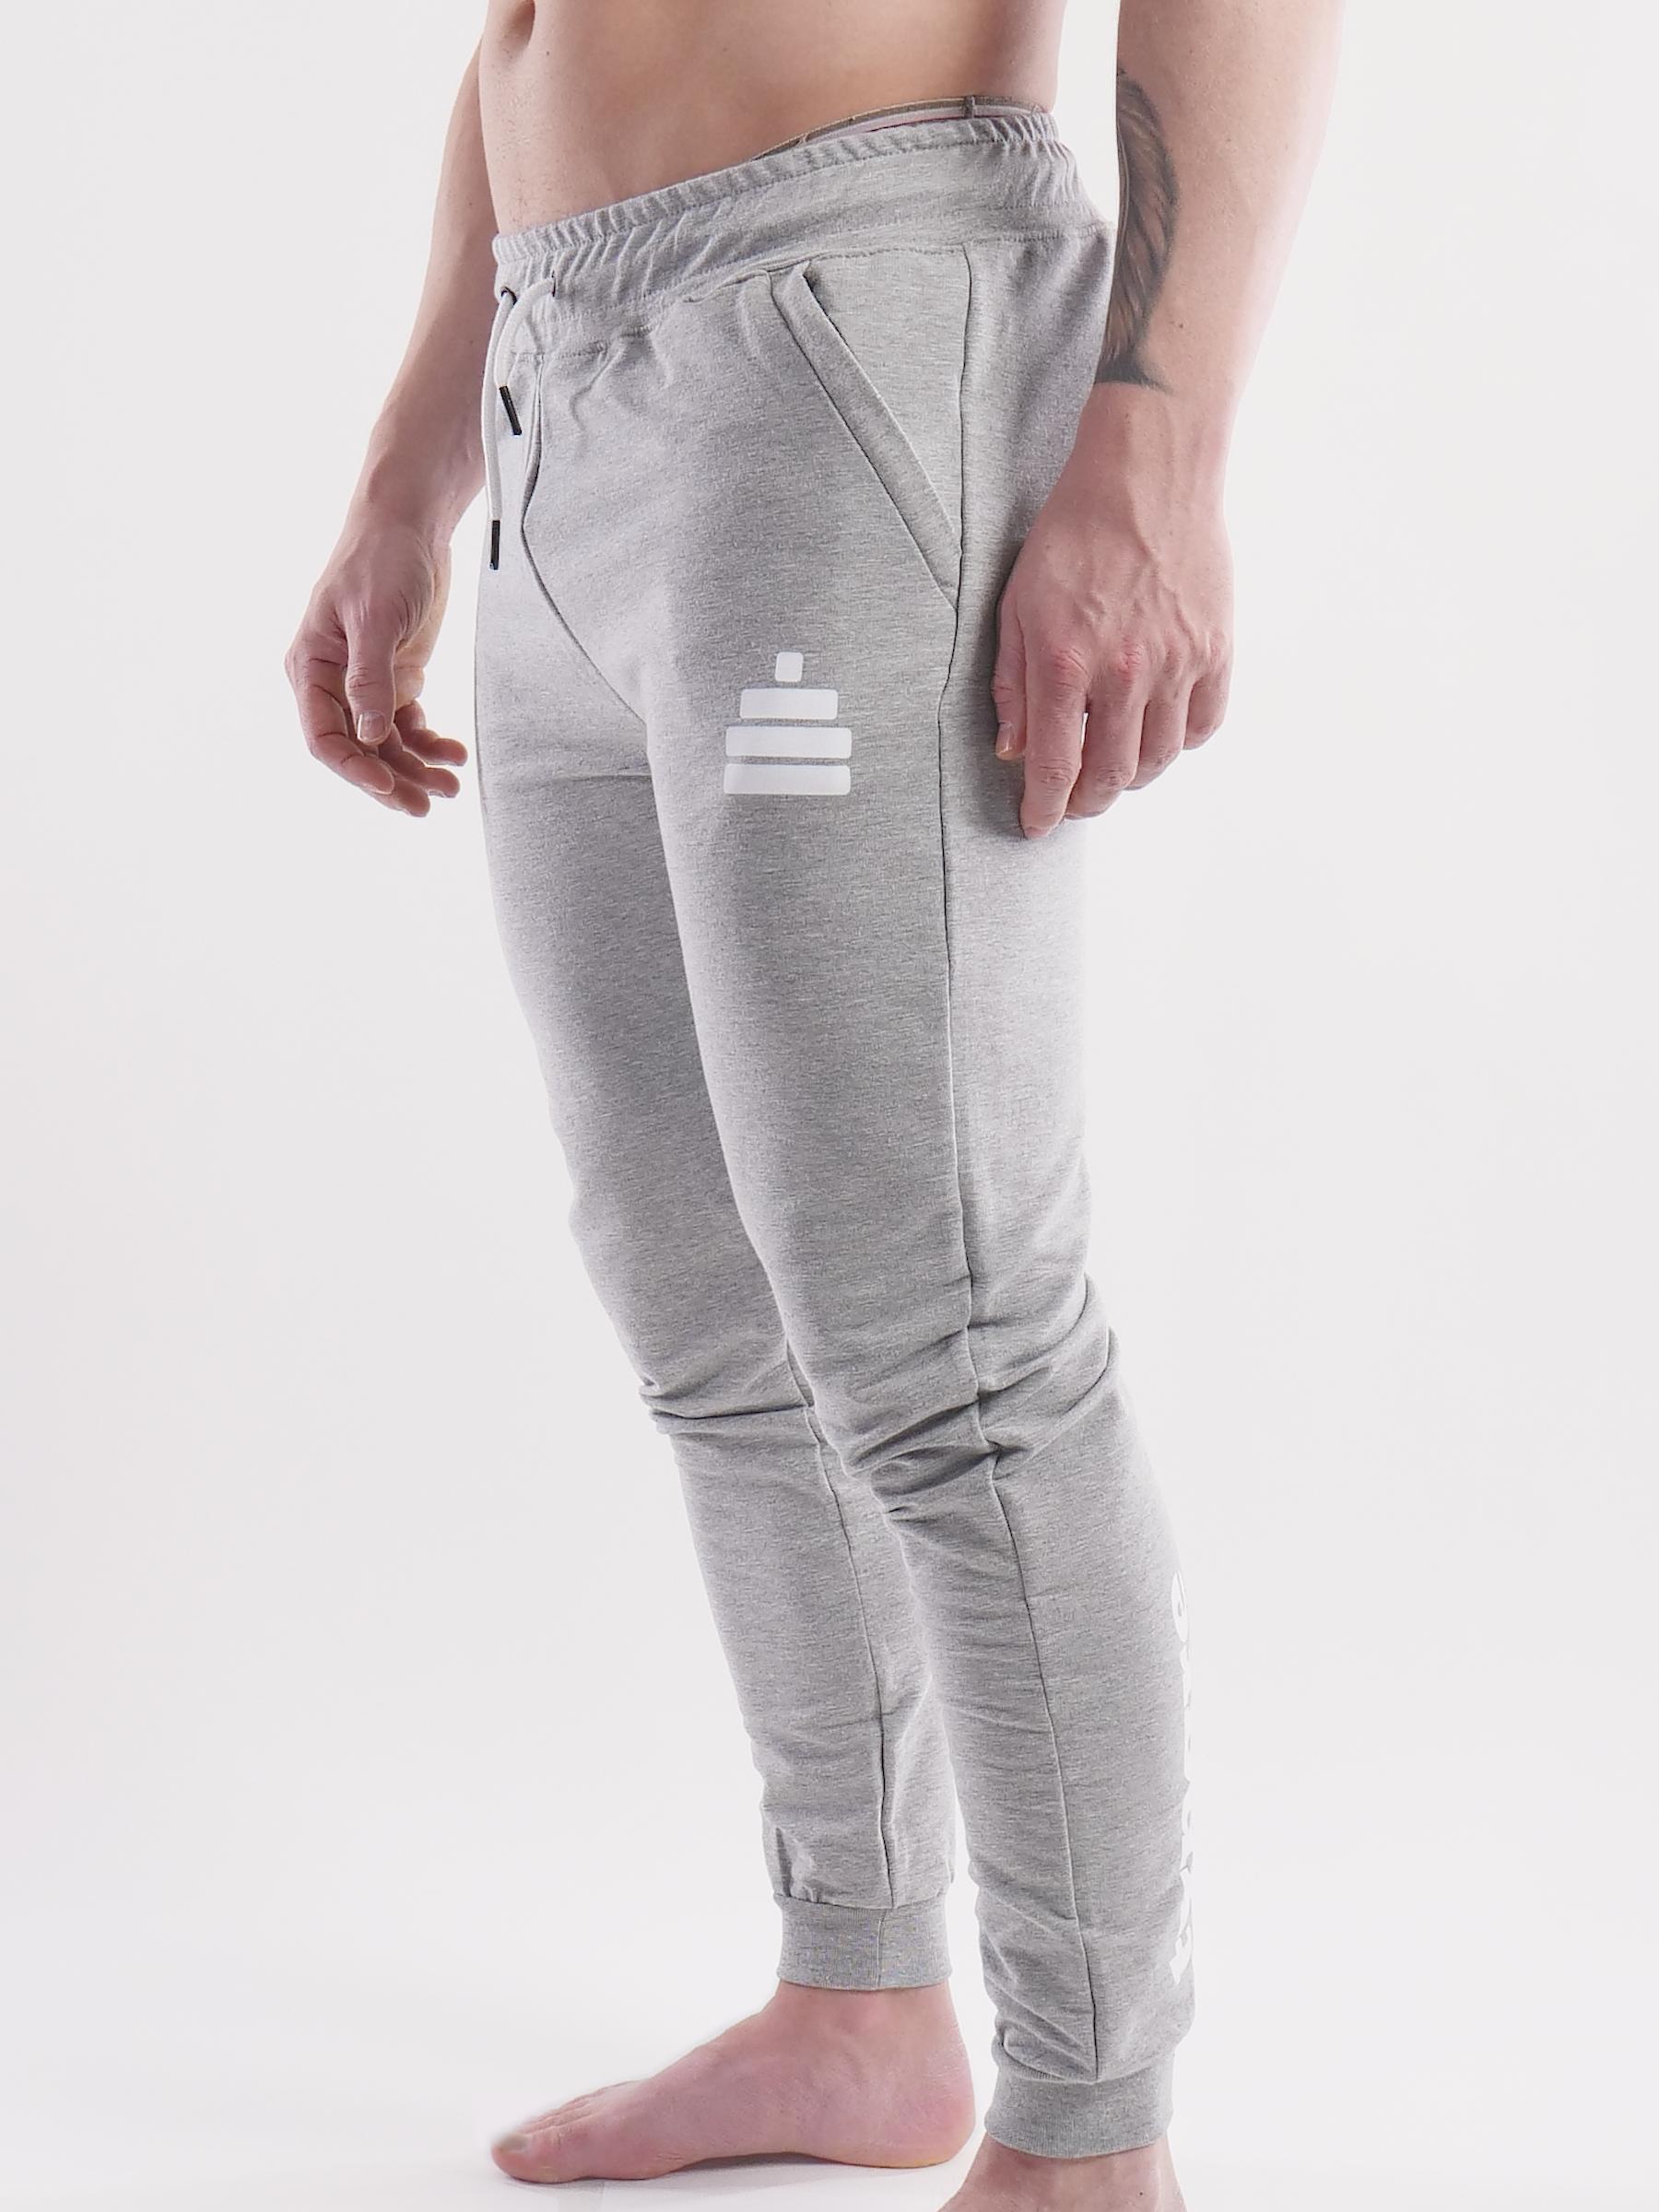 Sweatpants Work Mens Light Gray